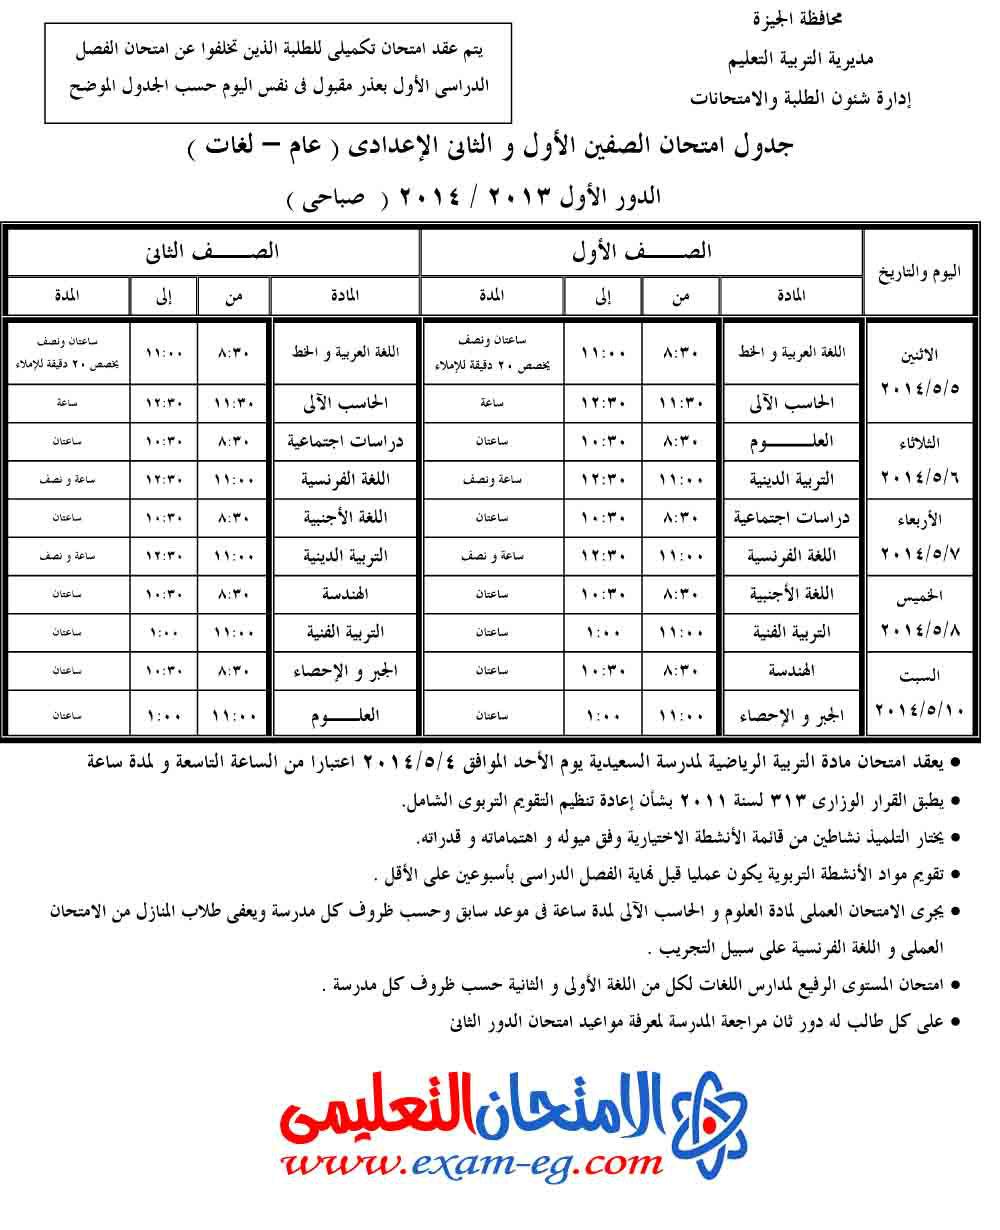 exam-eg.com_1397580096447.jpg